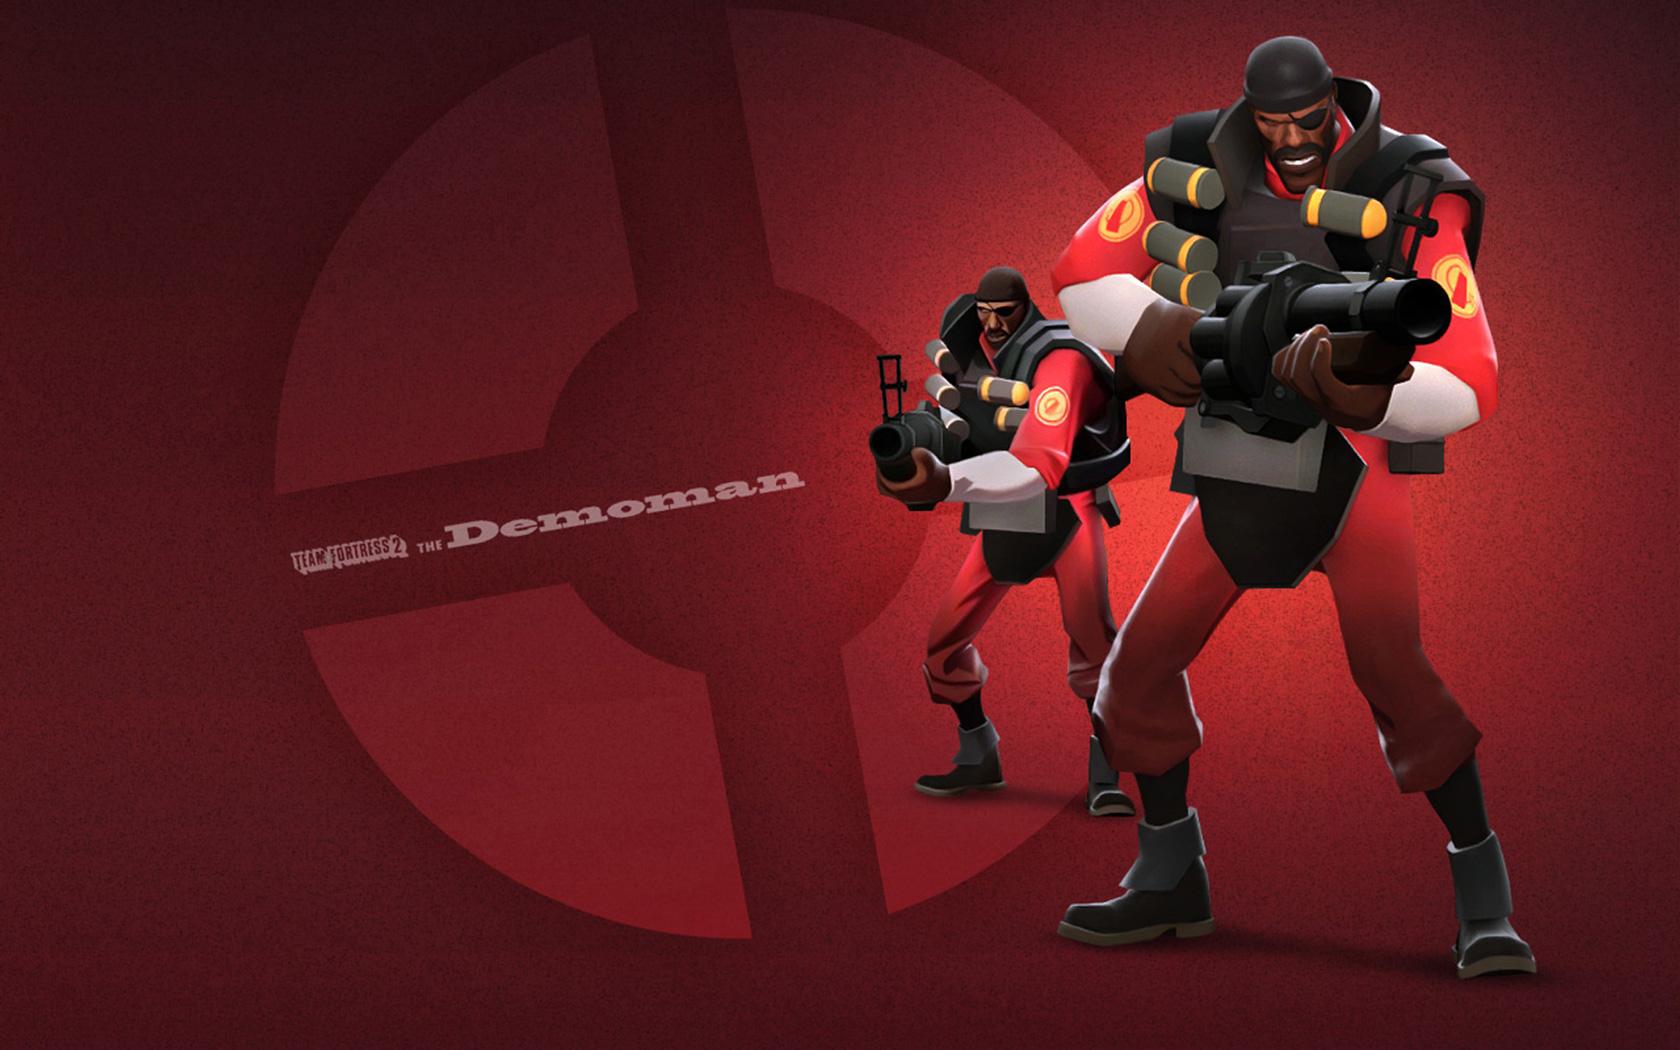 Team Fortress 2 Wallpaper in 1680x1050